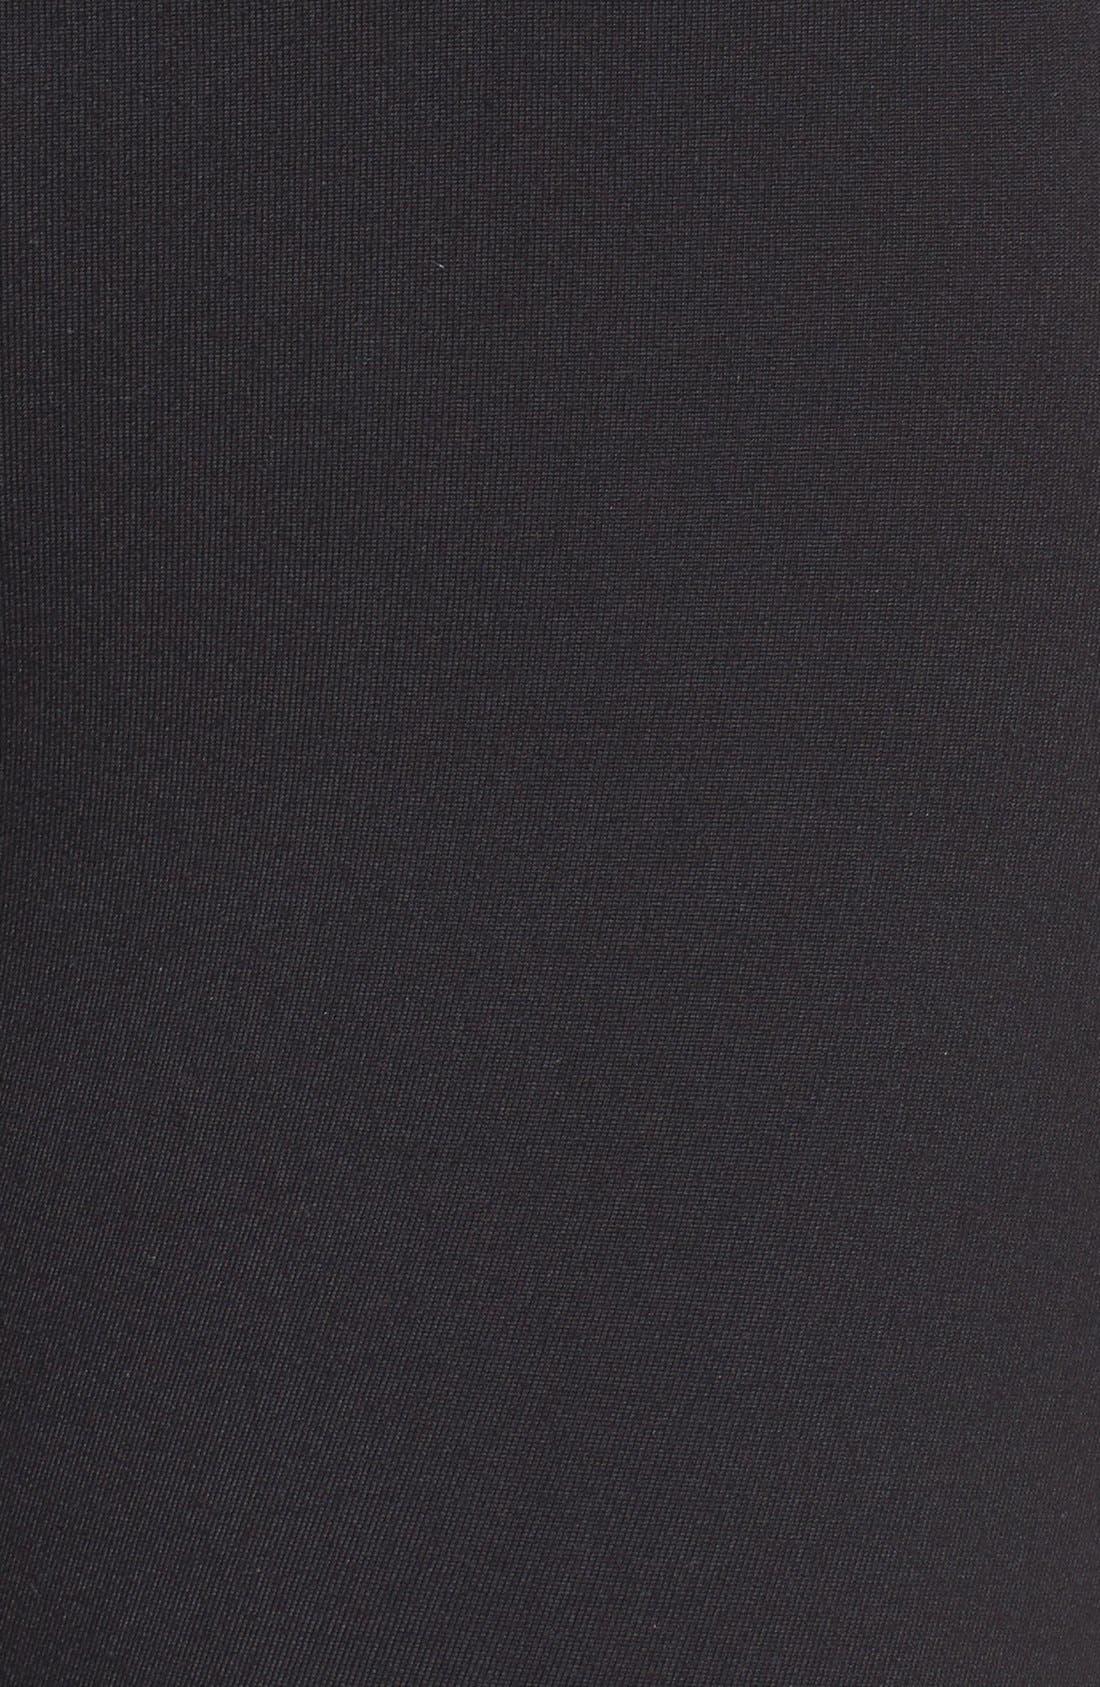 'Bardot' High Waist Leggings,                             Alternate thumbnail 6, color,                             Black